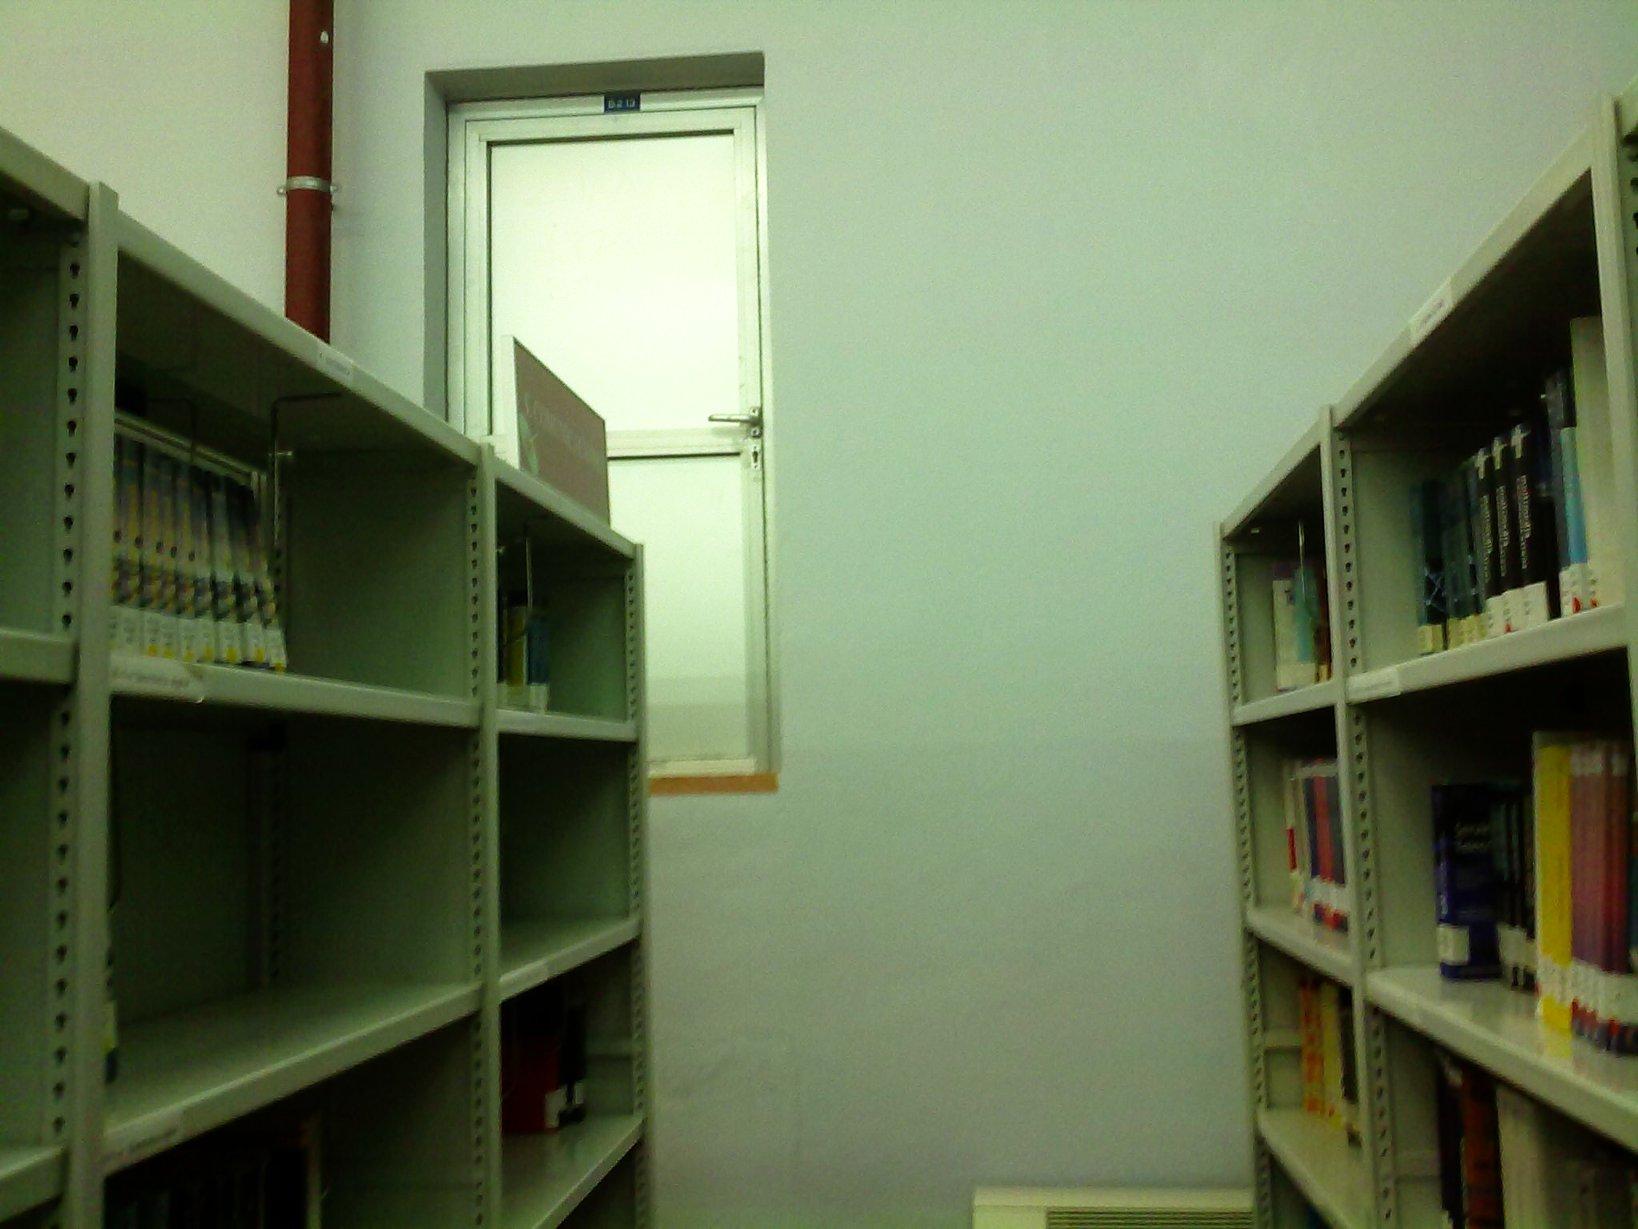 La otra puerta